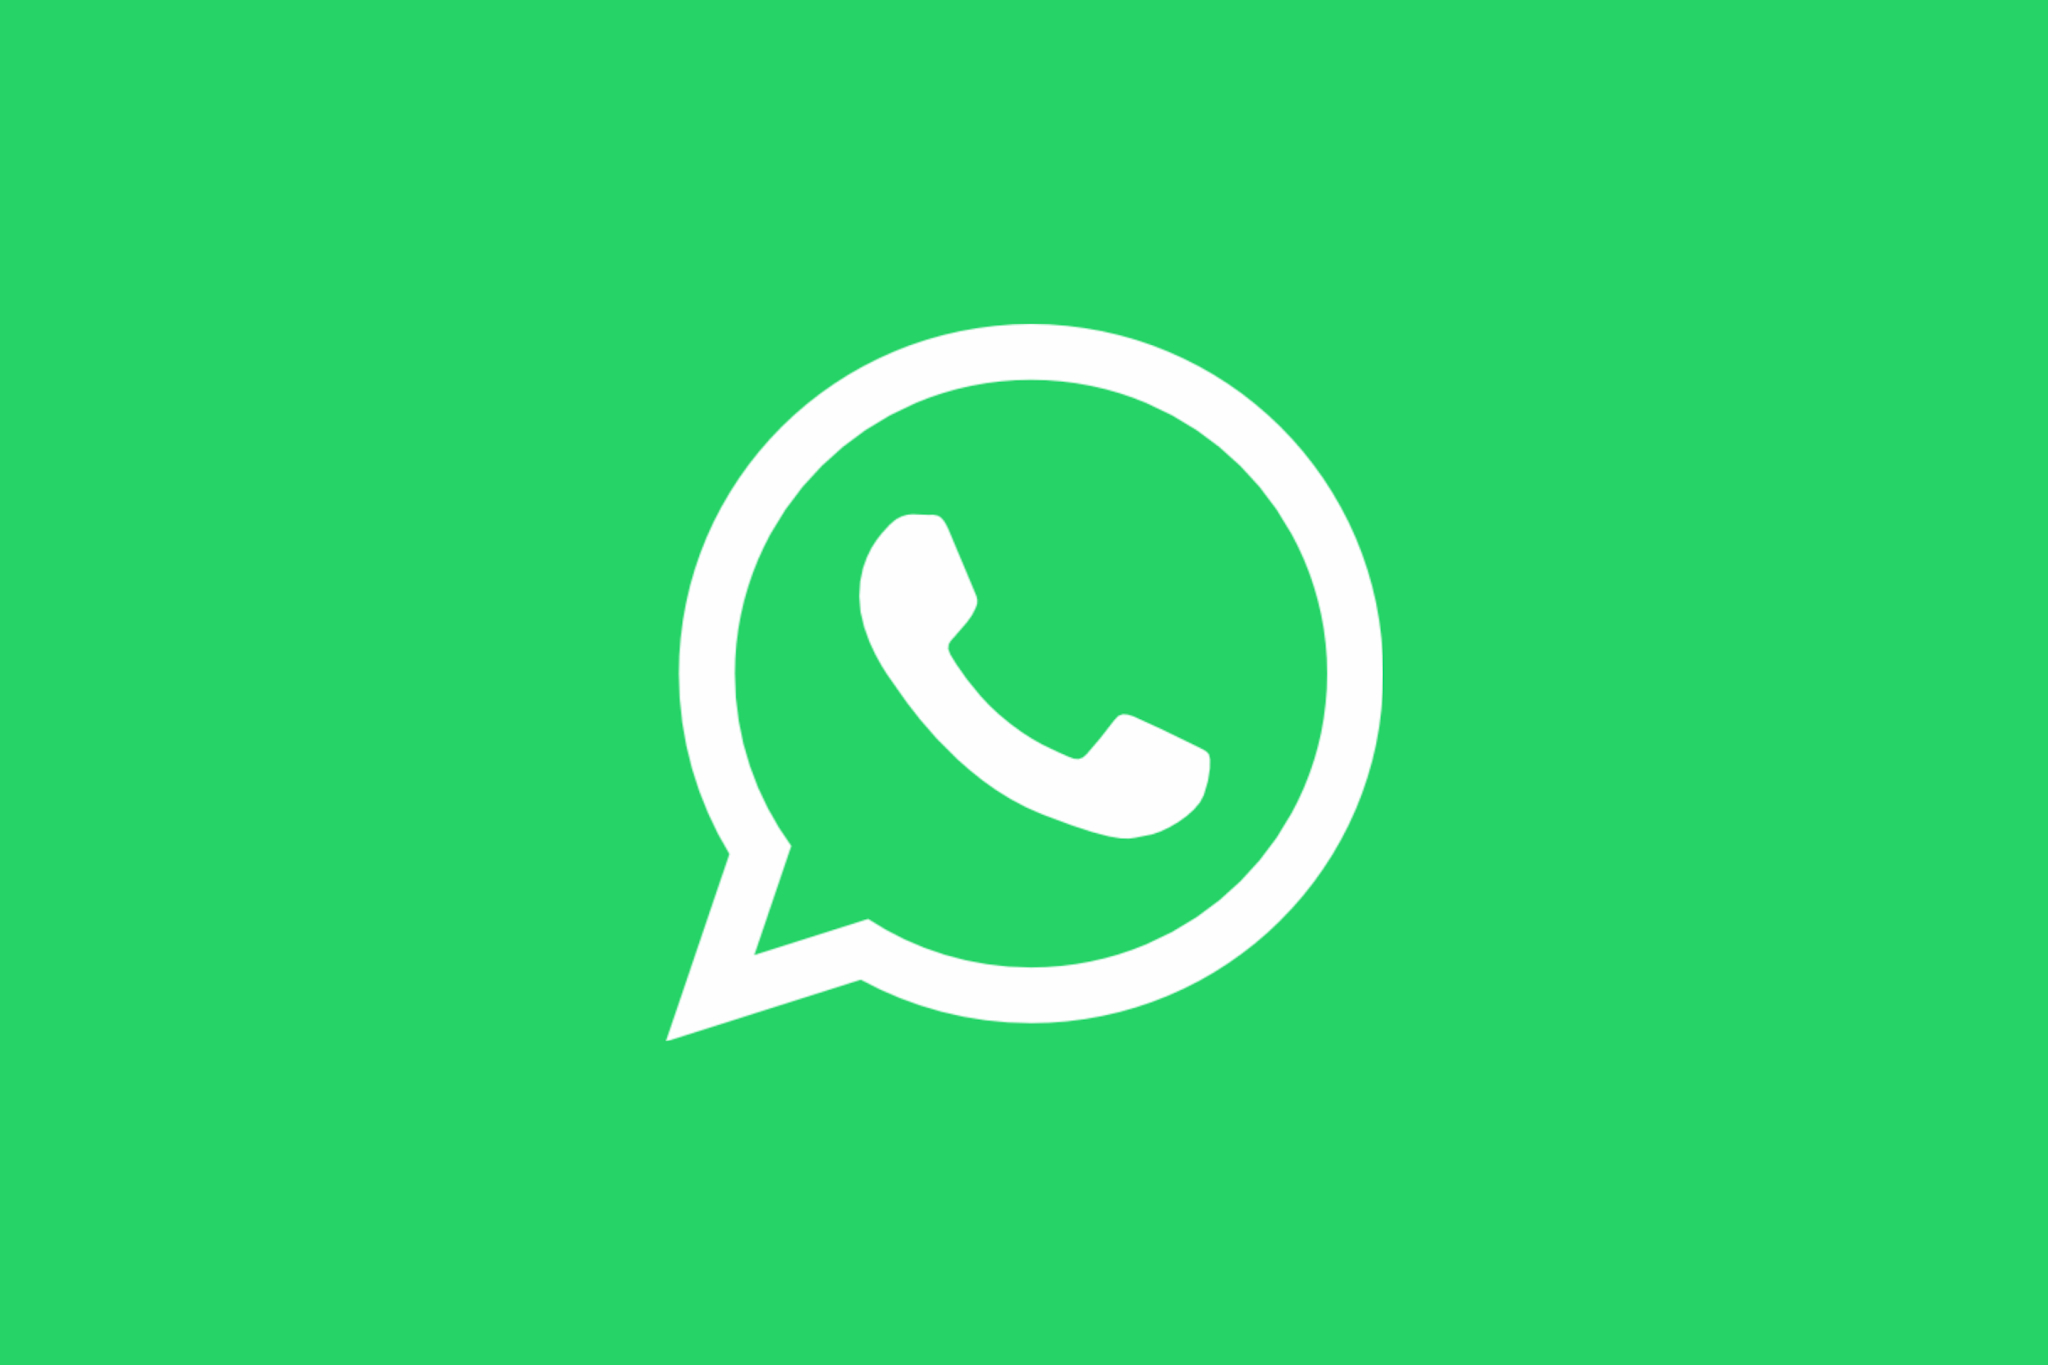 Cara Mengetahui Kontak WhatsApp Yang Memenuhi Memori Internal HP